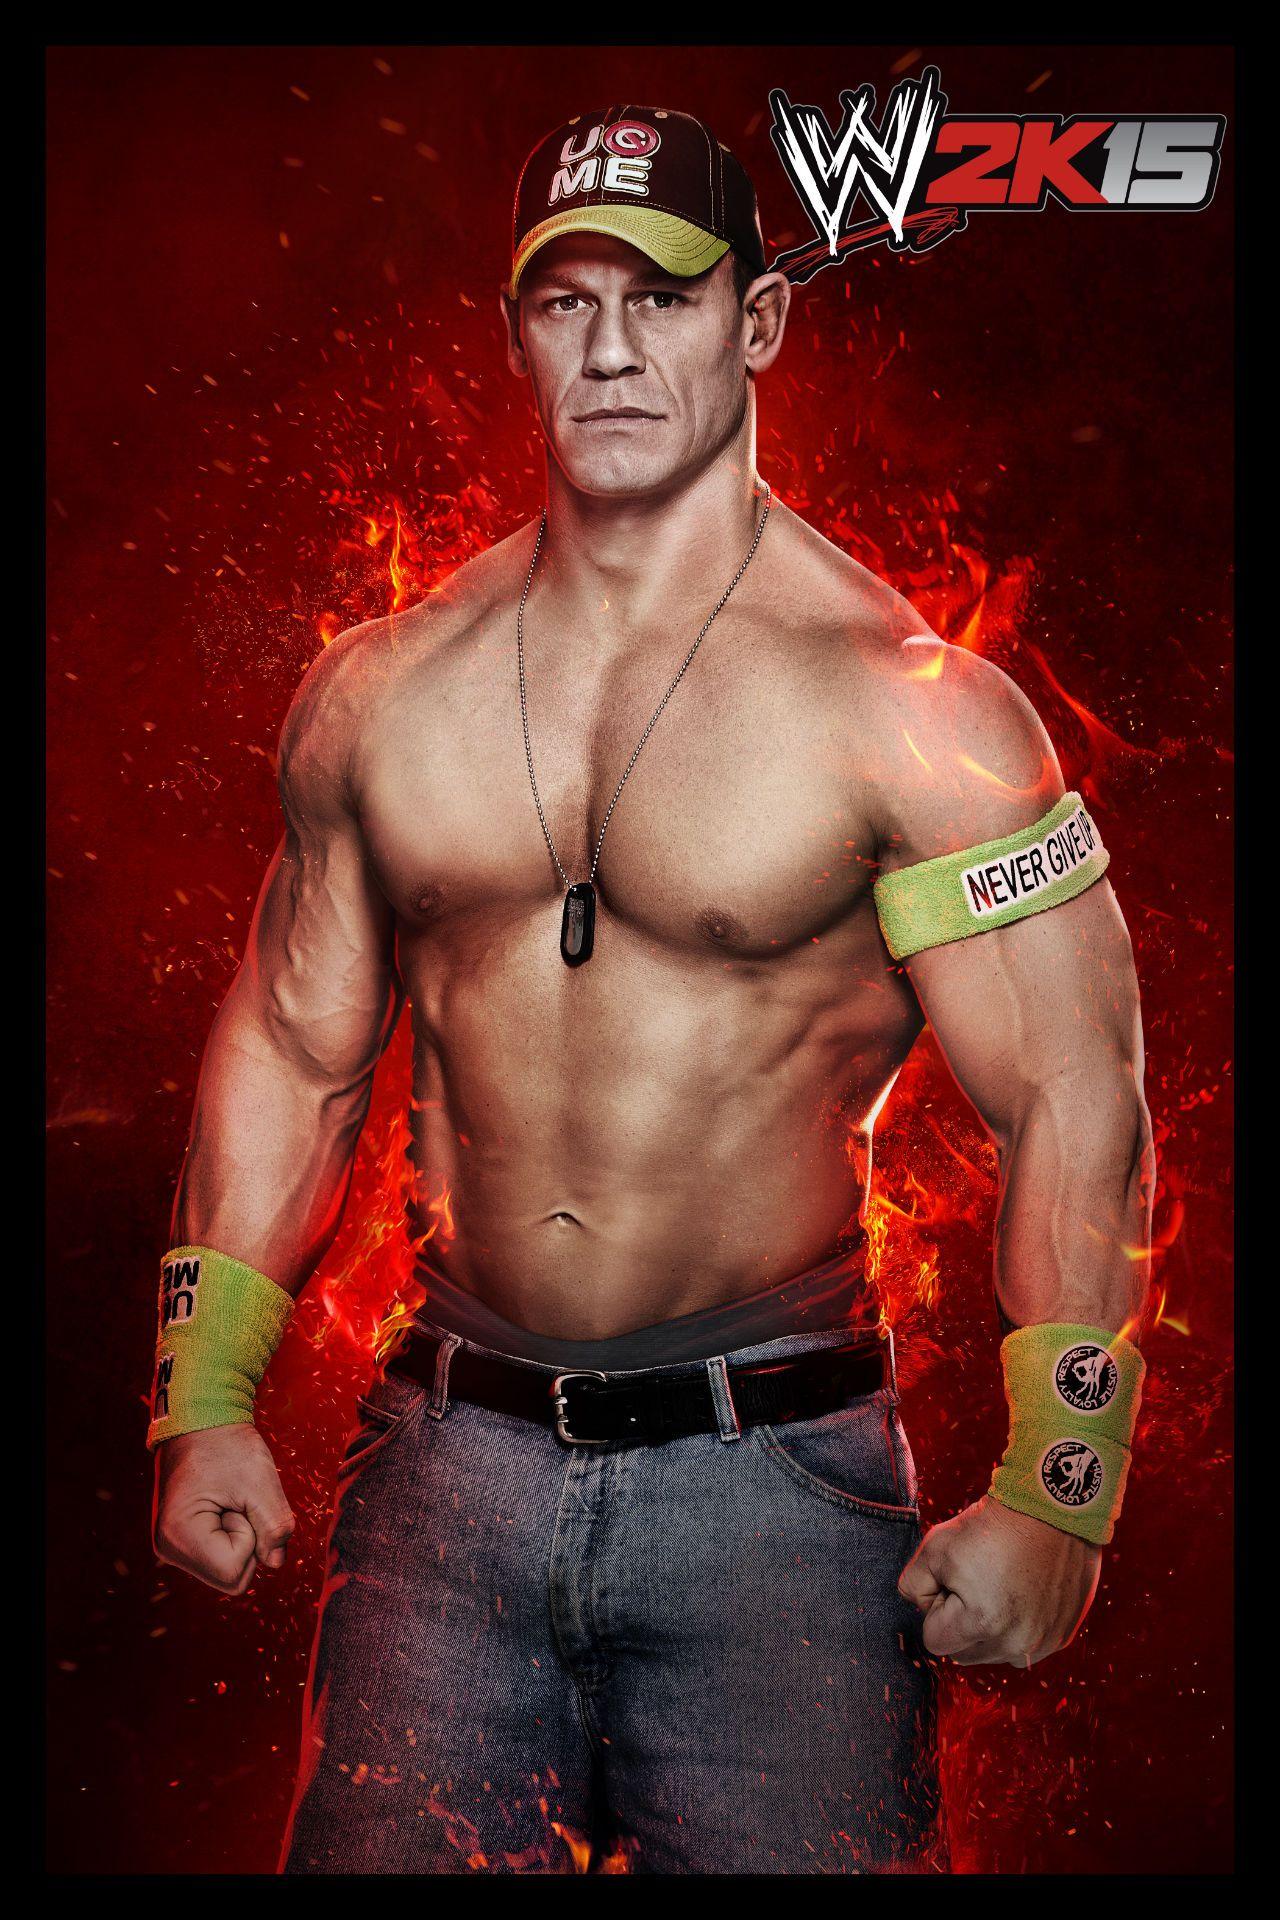 Wwe2k15 Delayed Release Date Making Of Wwe2k15 Part 2 Details Http Www Wwerumblingrumors Com Wwe2k15 Delayed Release John Cena Wrestling Superstars Wwe